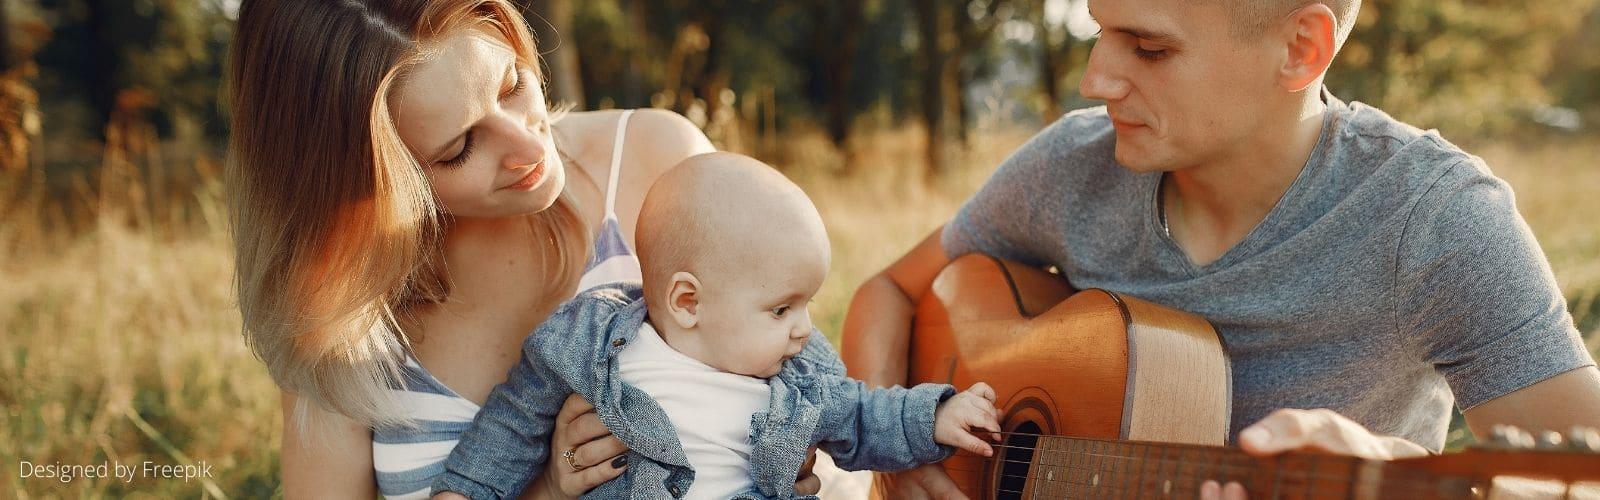 Éveil musical bébé